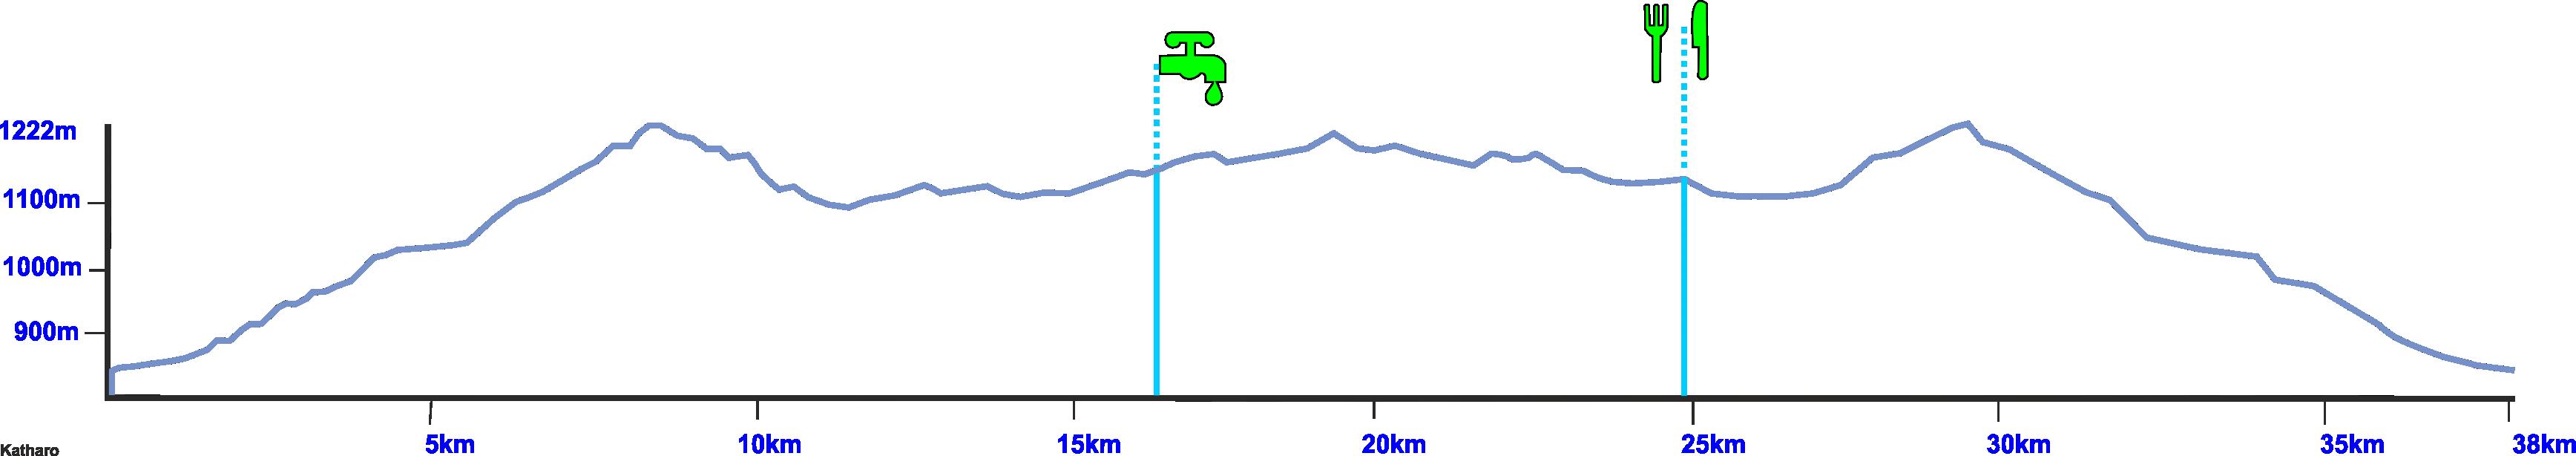 katharo plateau bike tour elevation profile